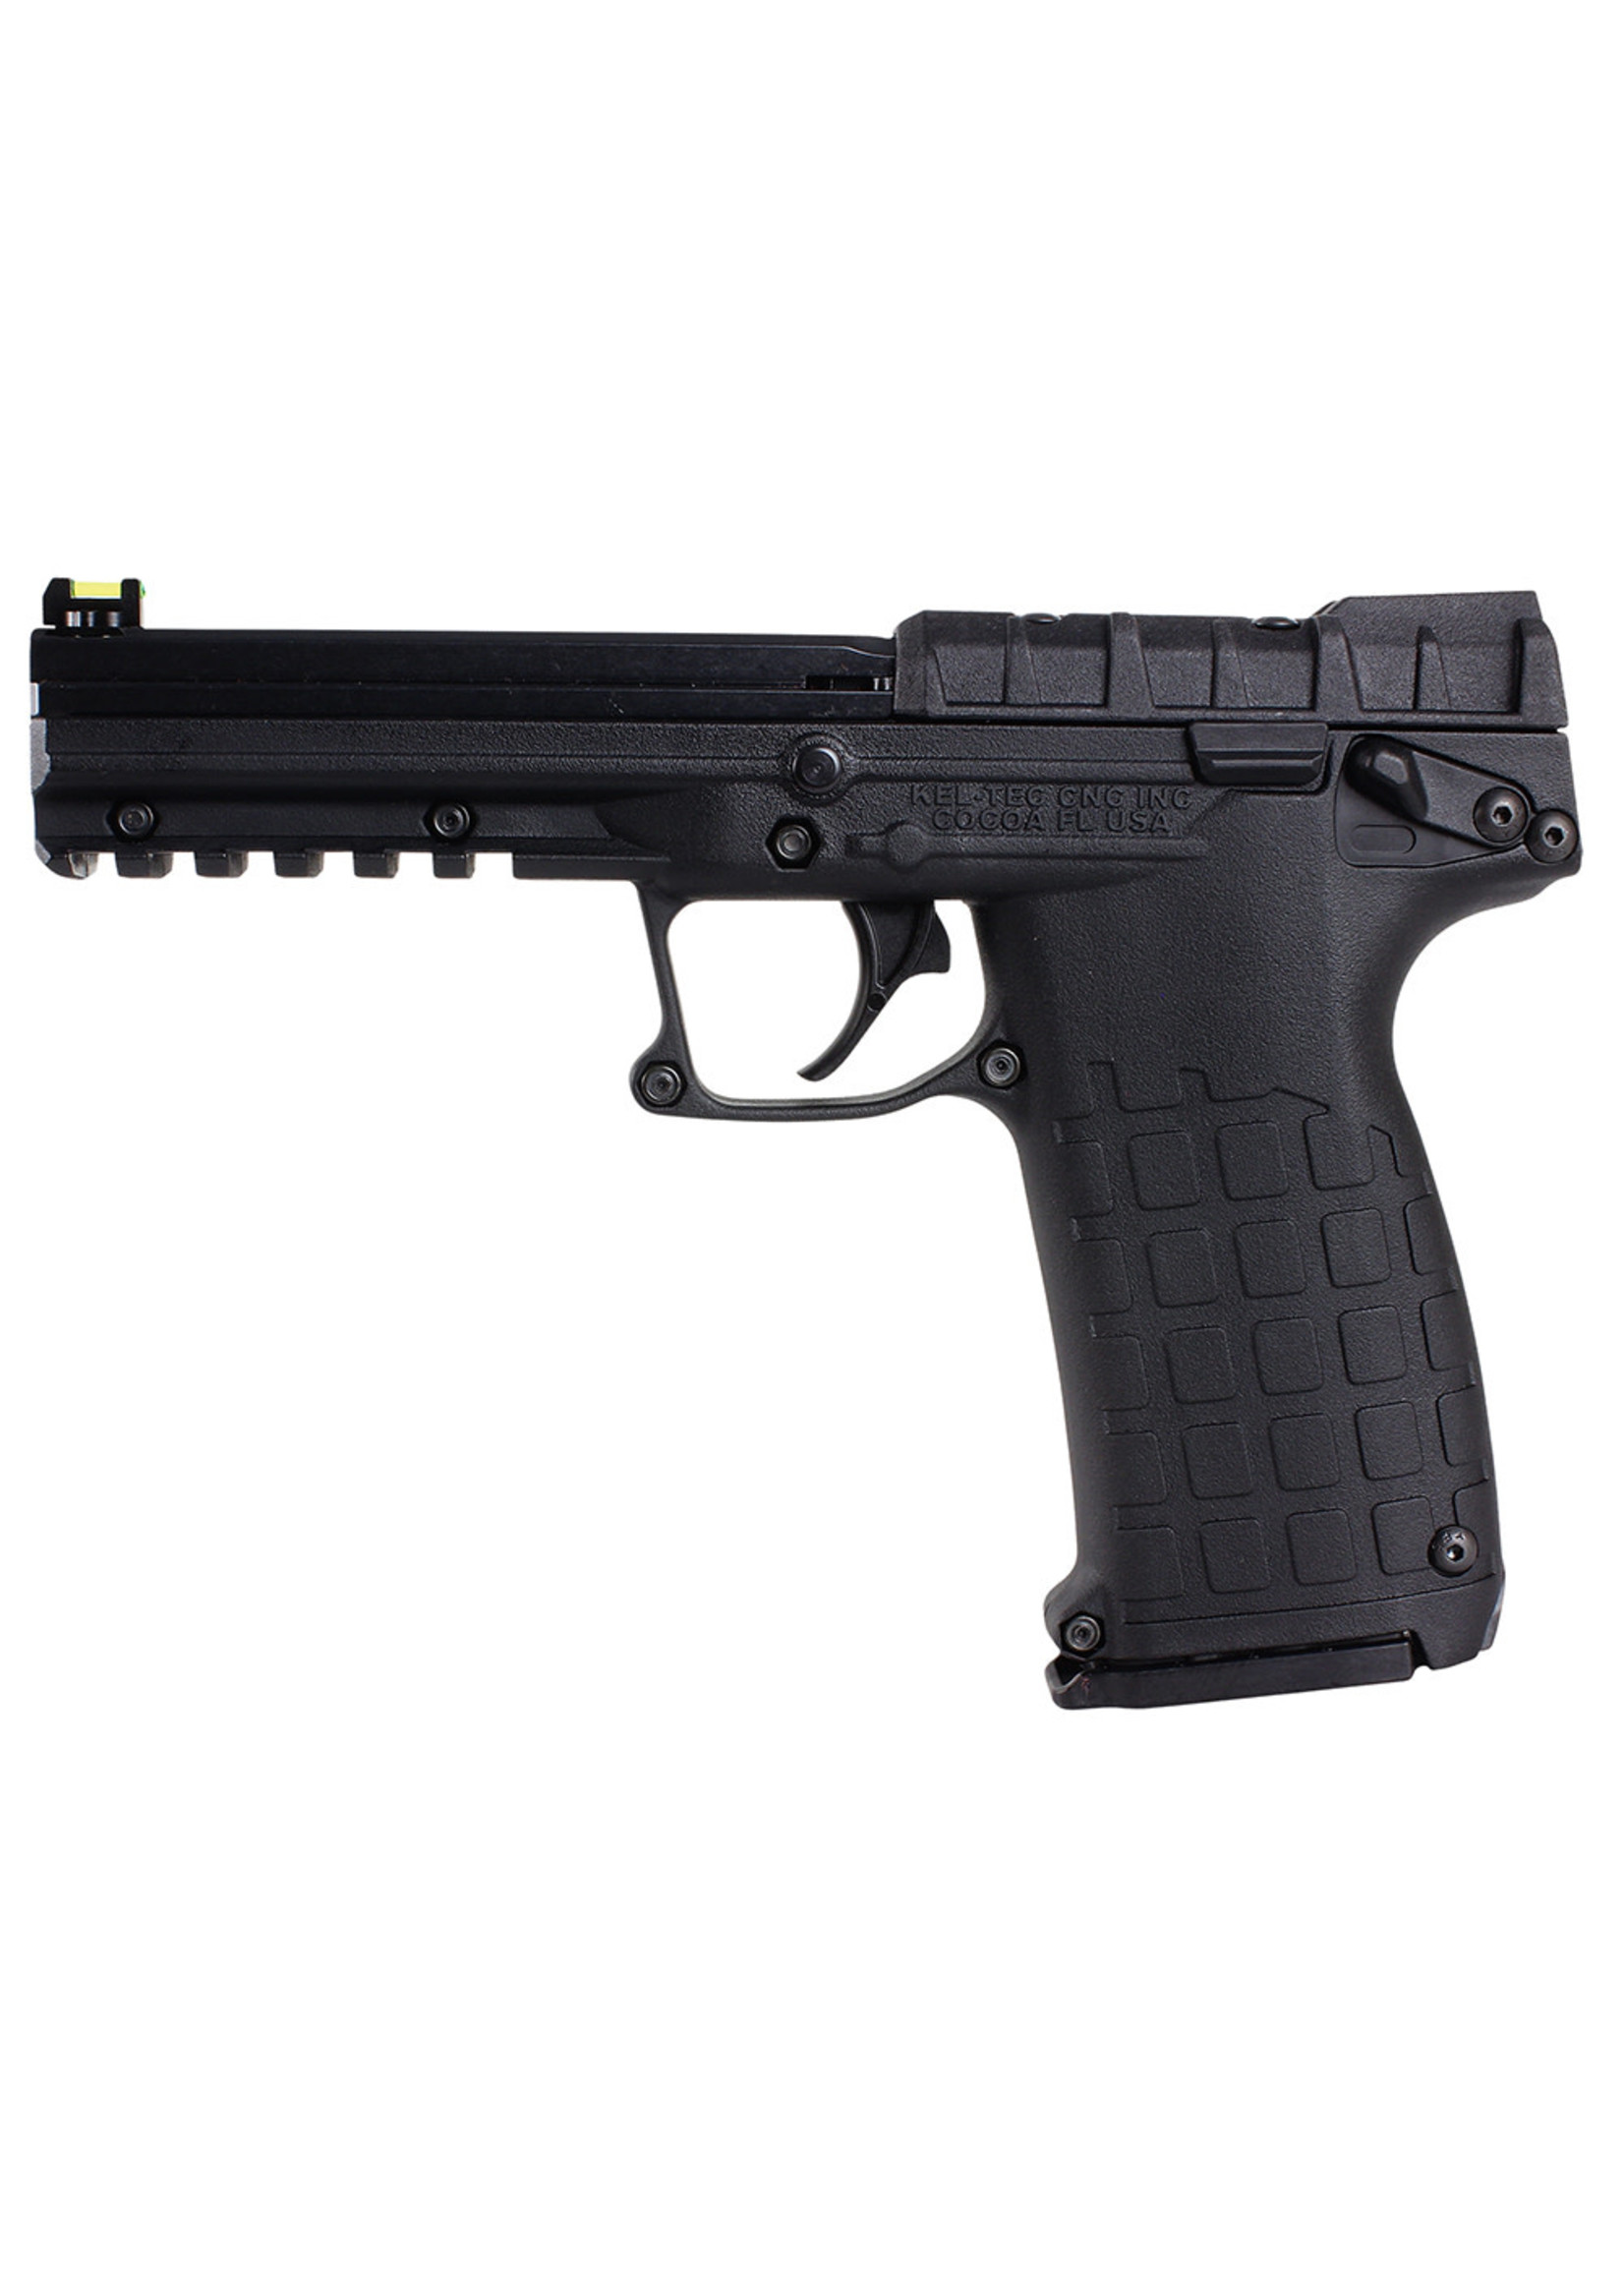 Kel-Tec Kel-Tec PMR-30 Pistol, 22 WMR, 30+1